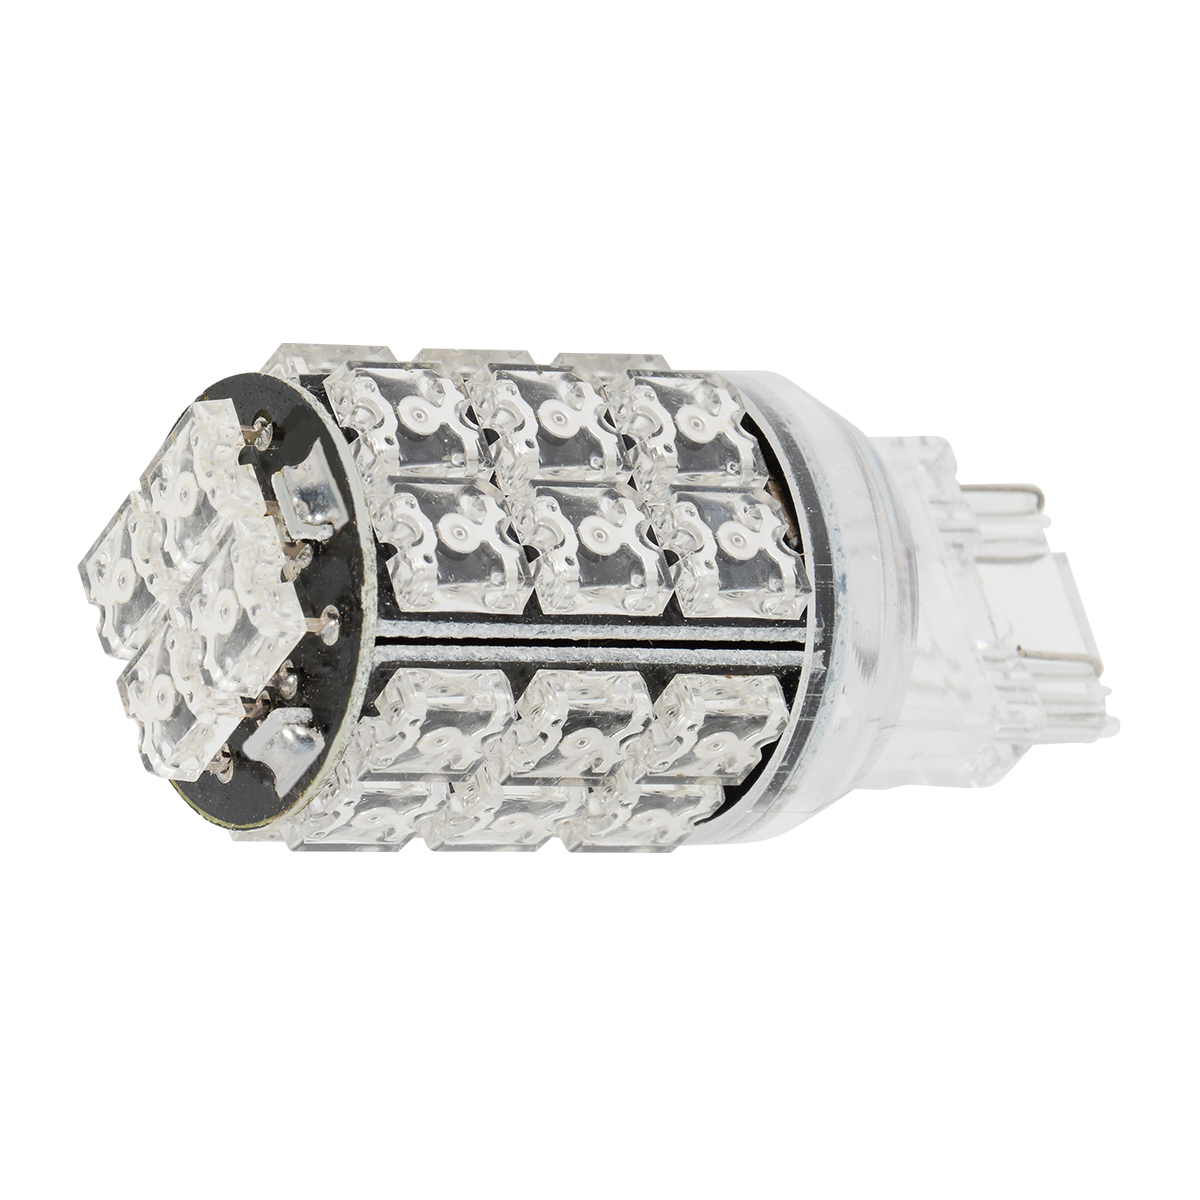 3157 Tower Style 28 LED Light Bulb